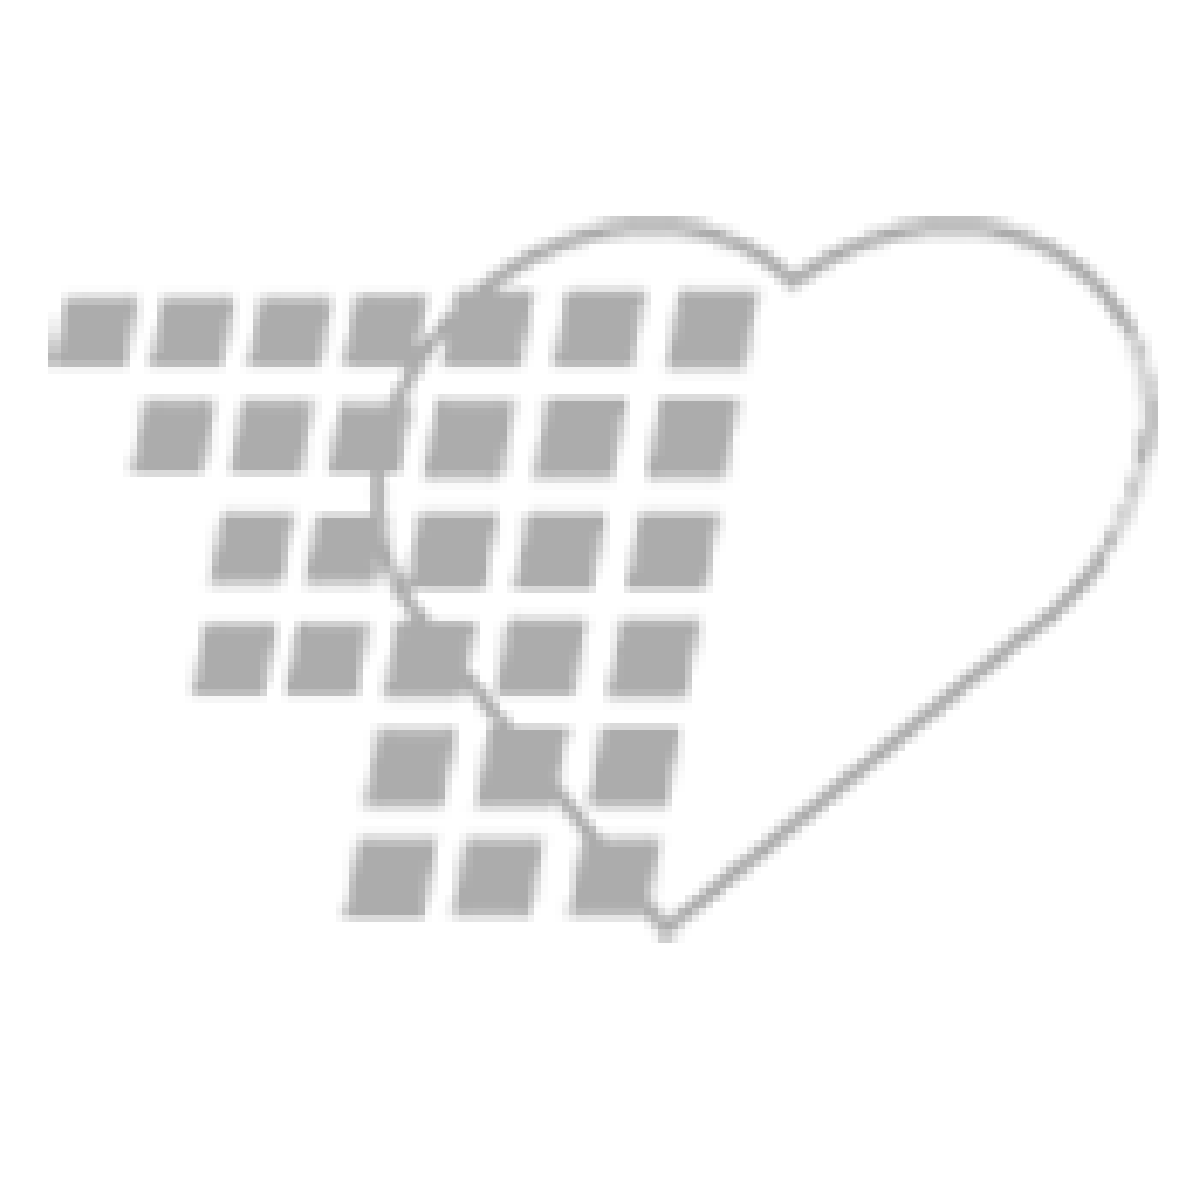 06-33-7630 Pharmacy Weighting Scale